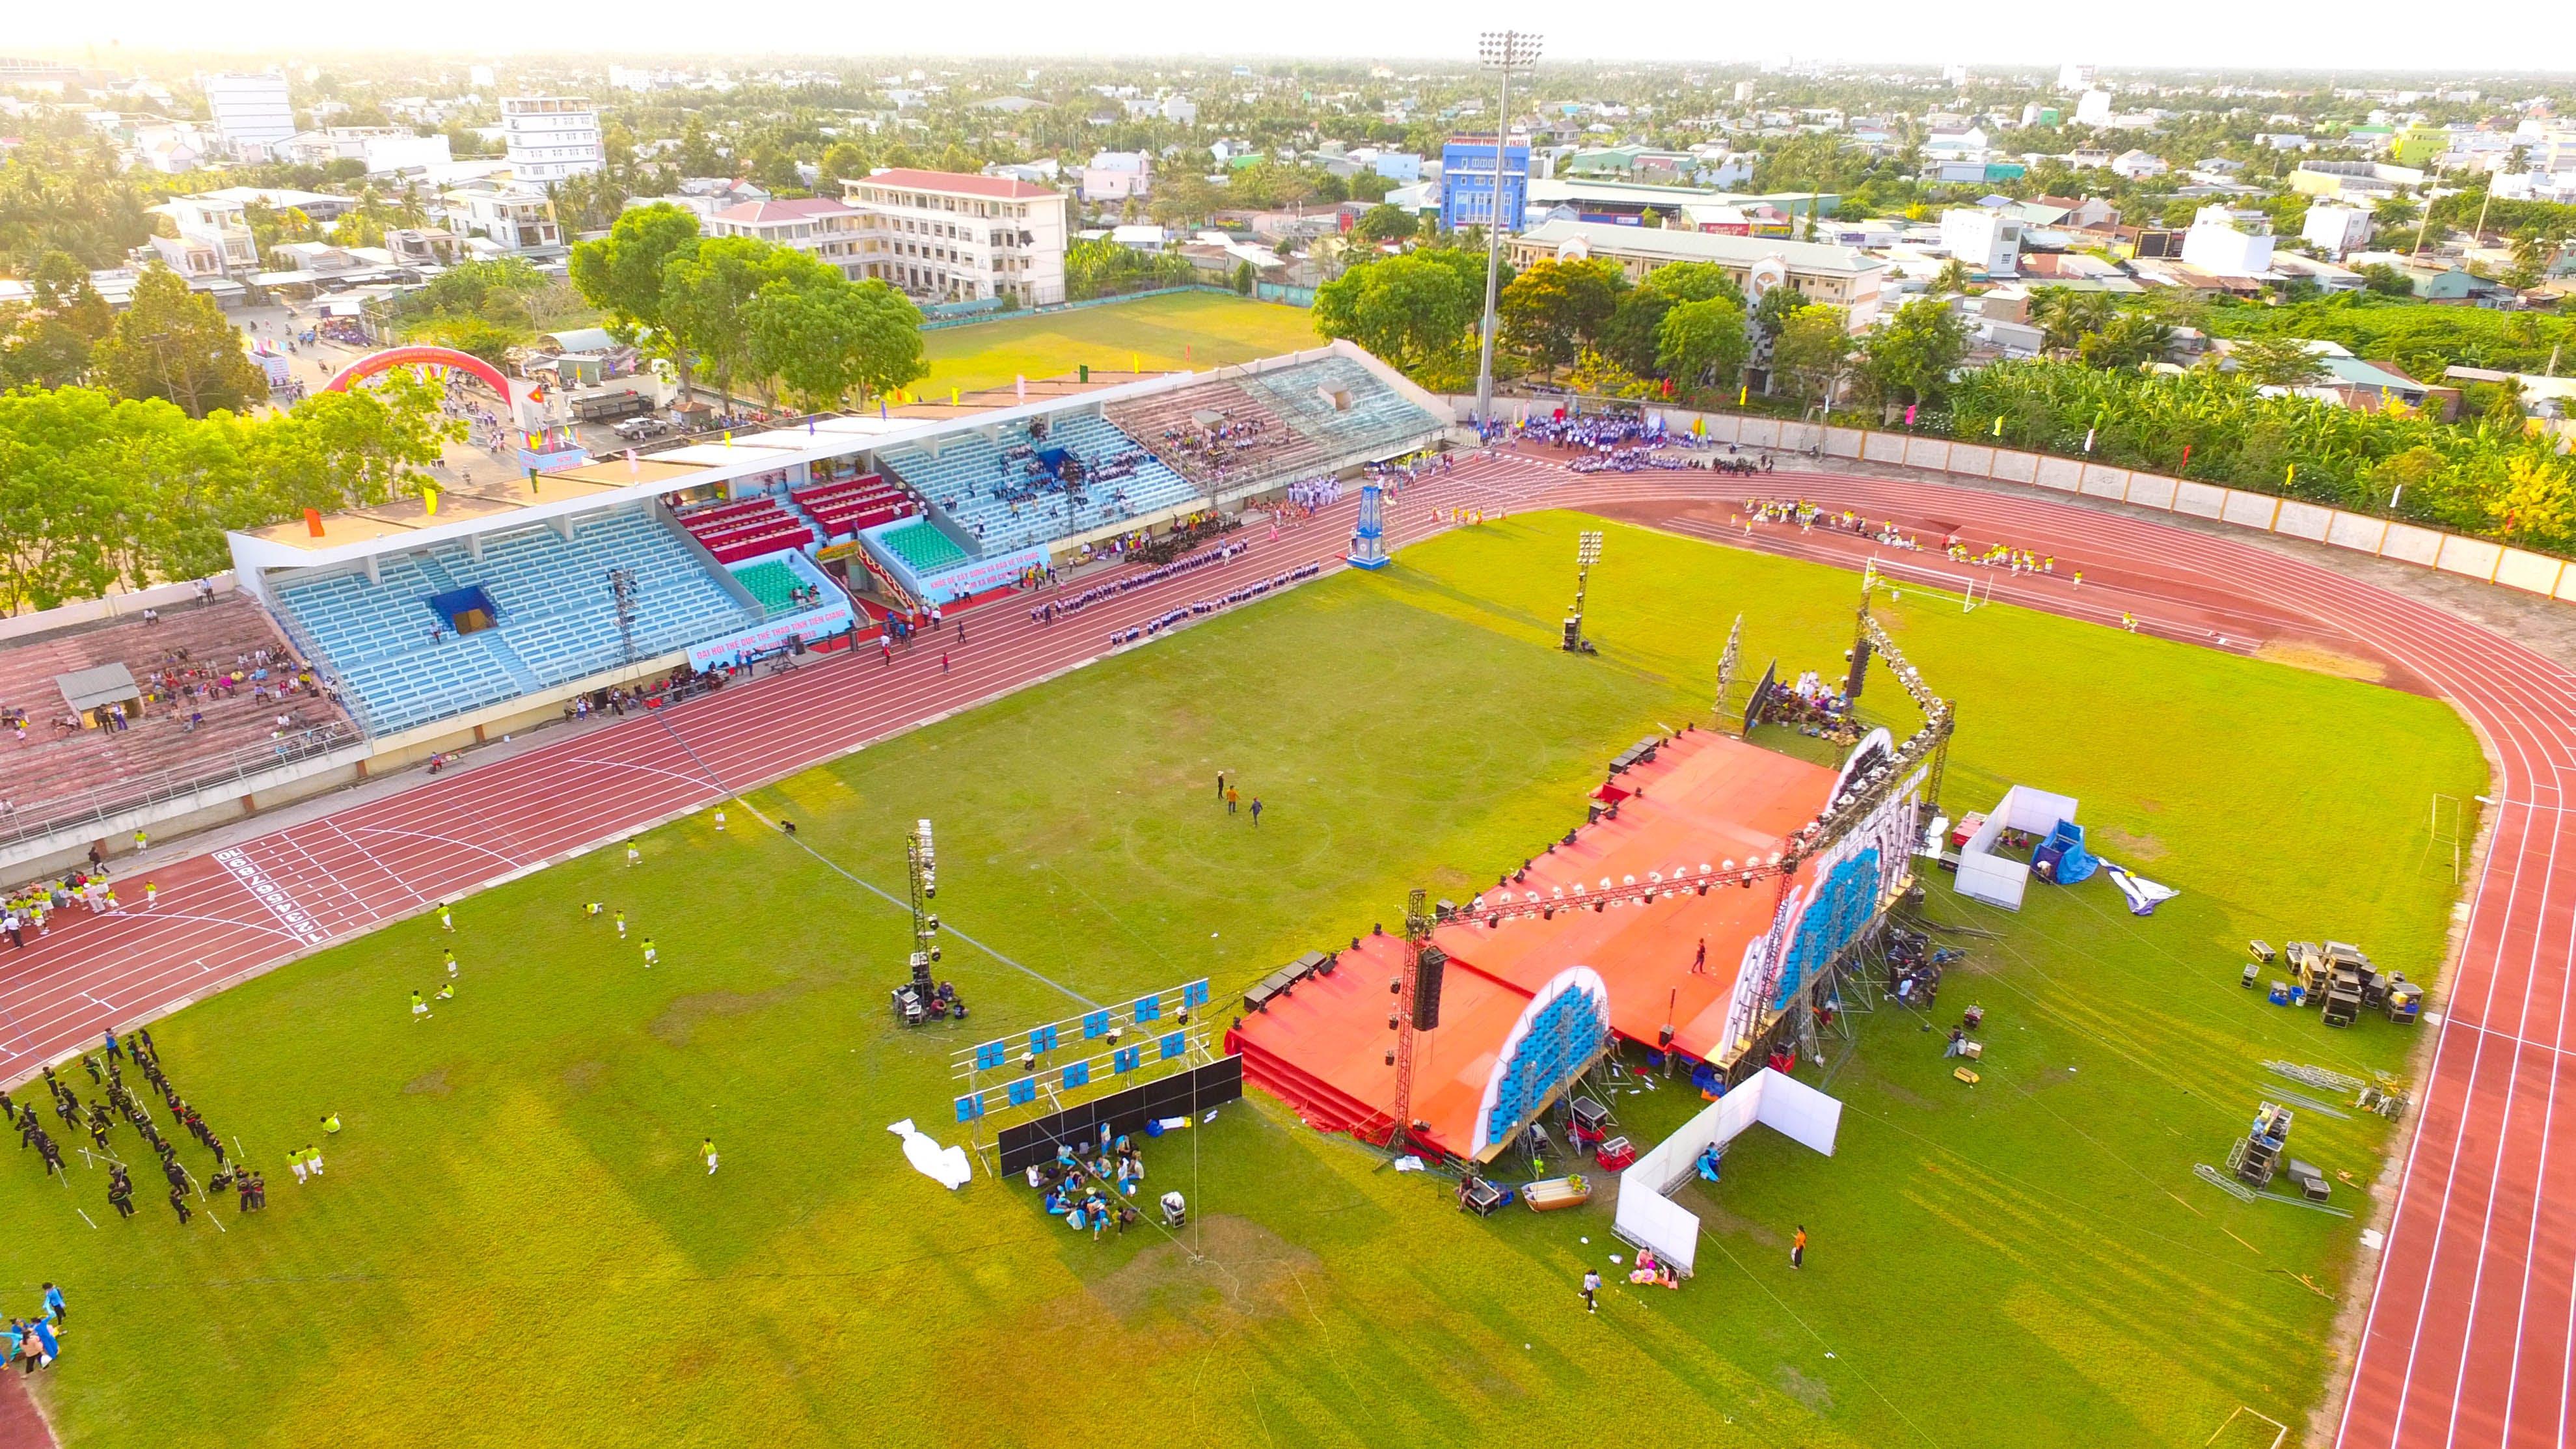 Aerial Photography of Stadium